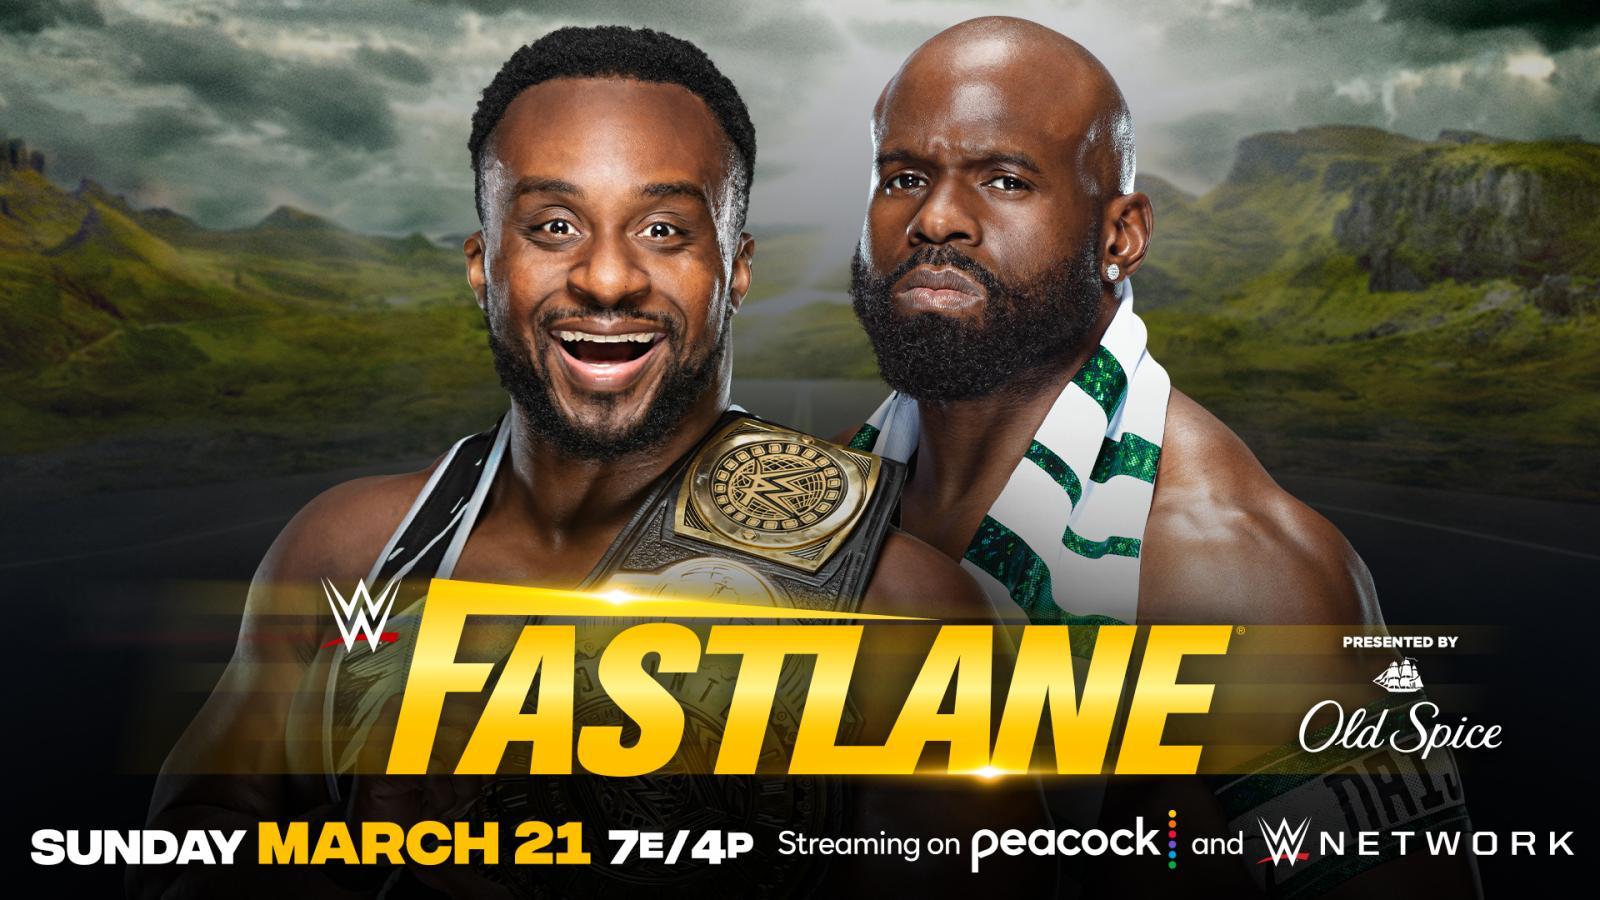 Intercontinental Championship Match é anunciada para o WWE Fastlane